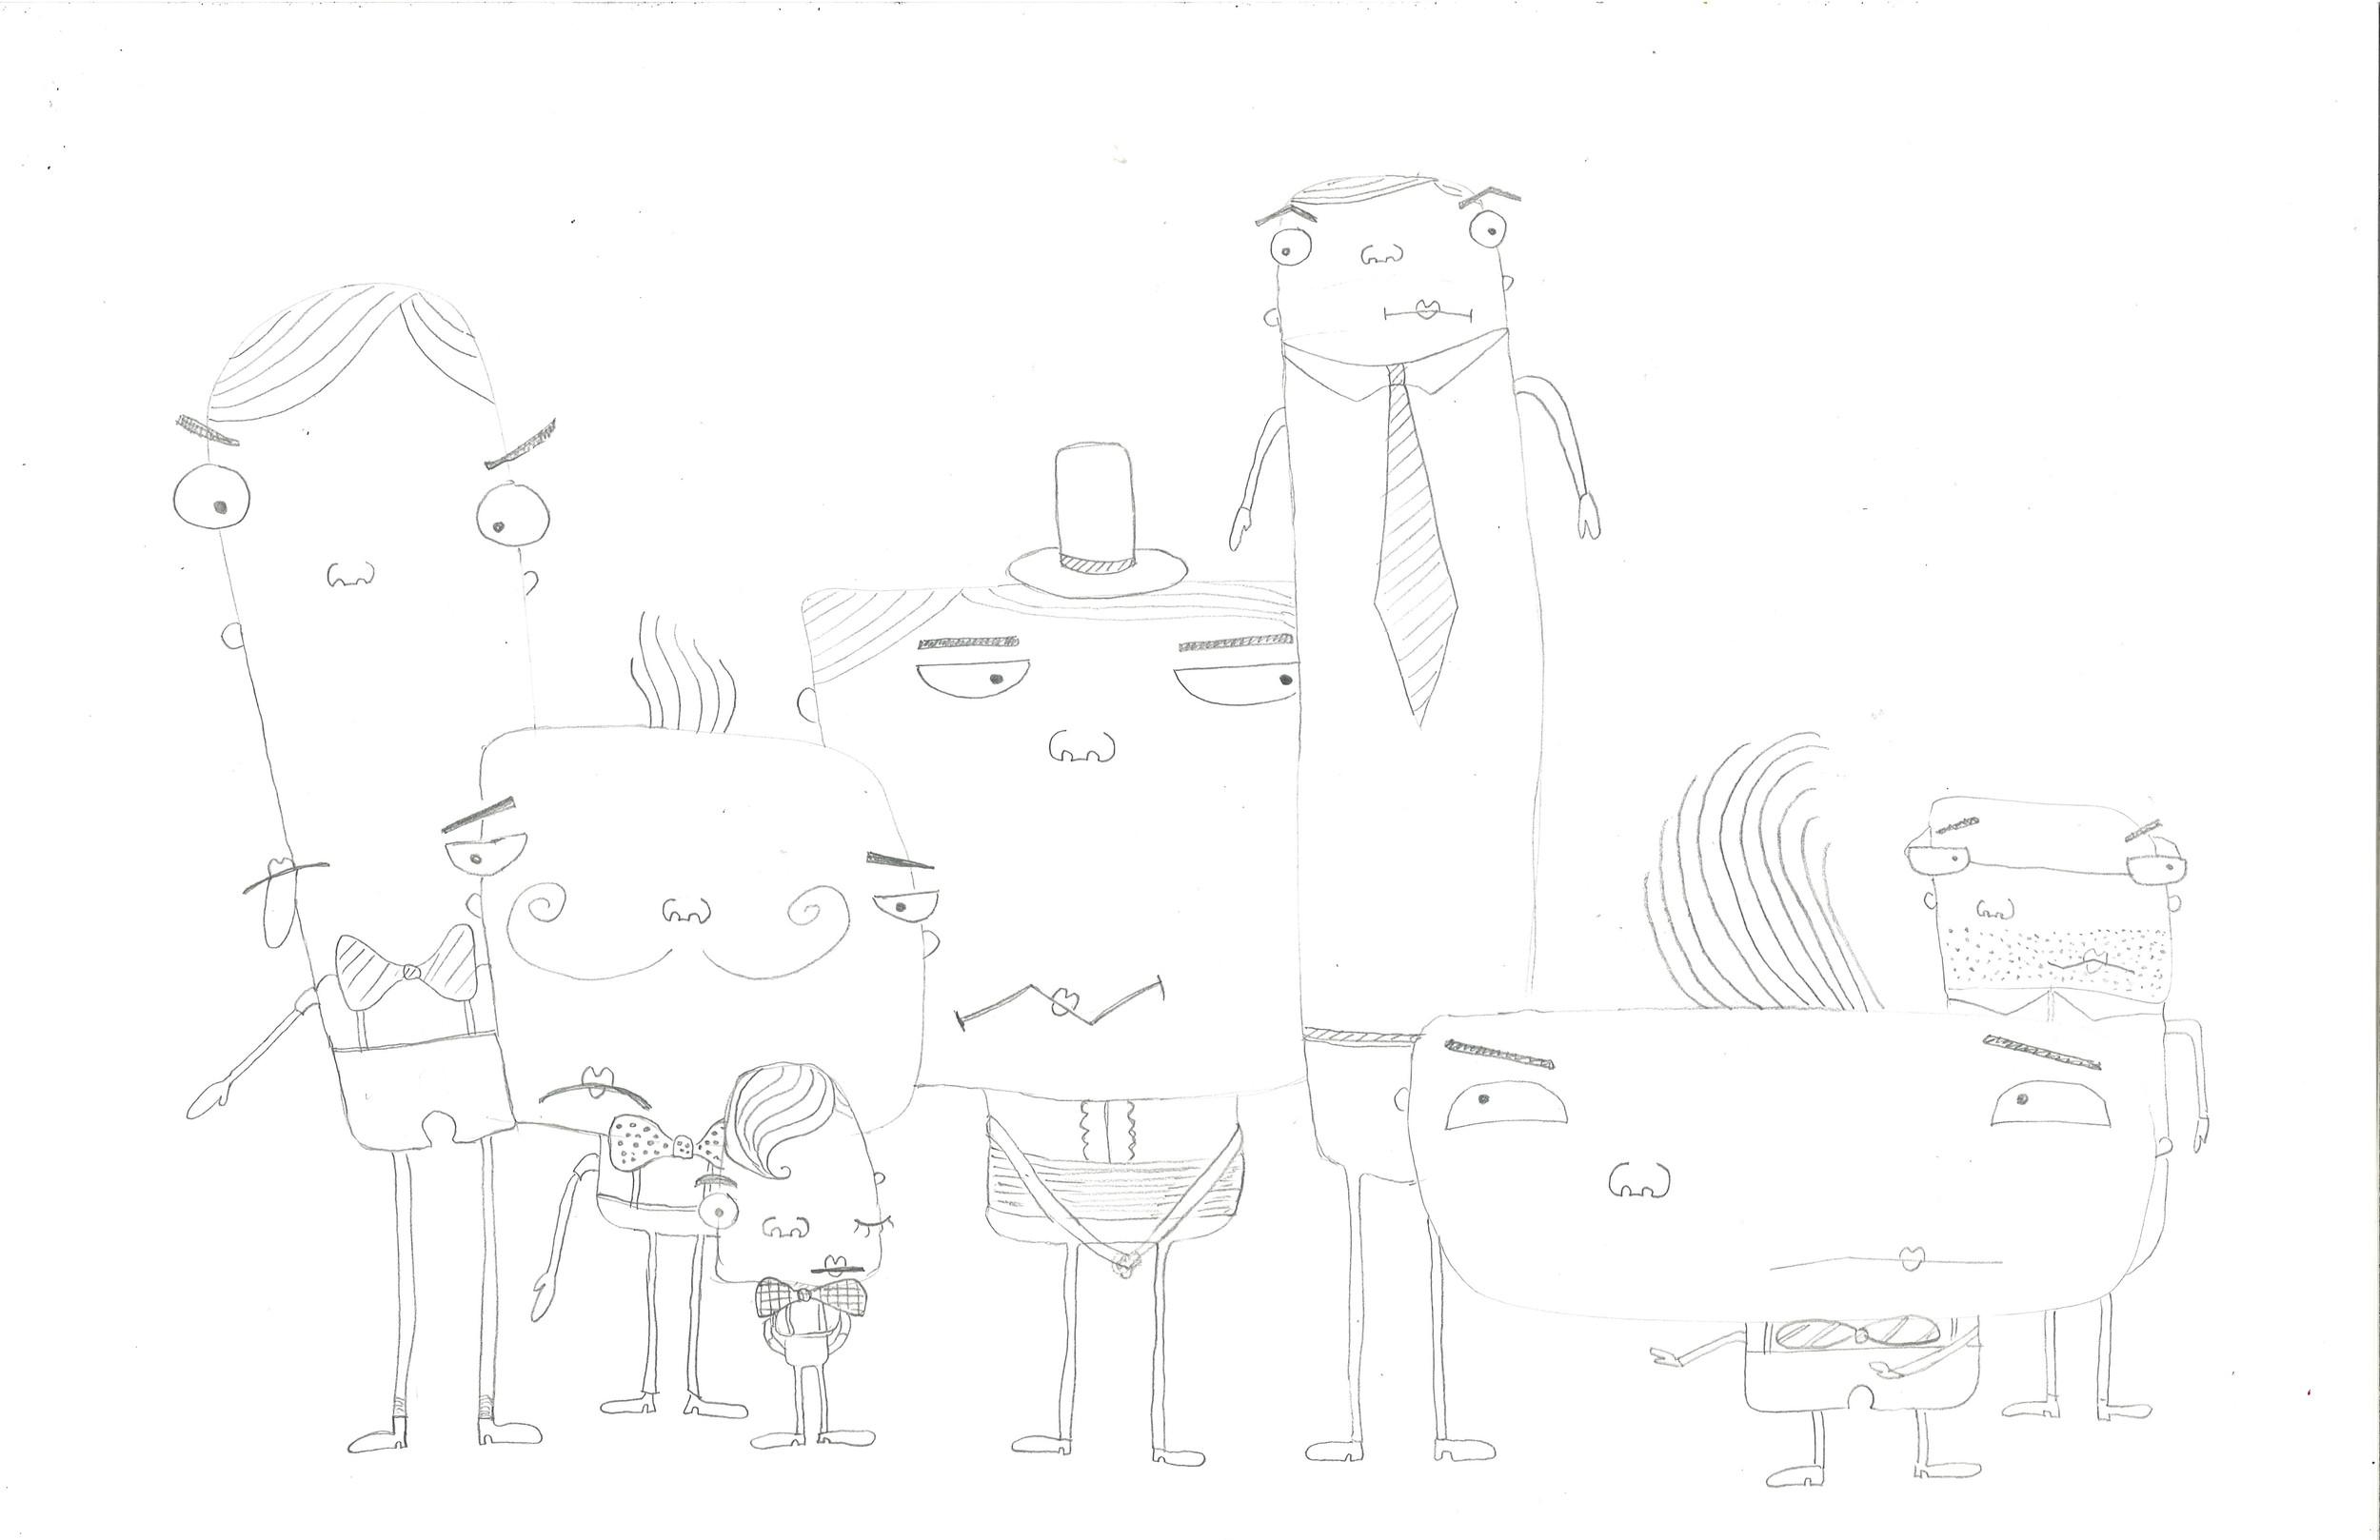 Band of grumpy men